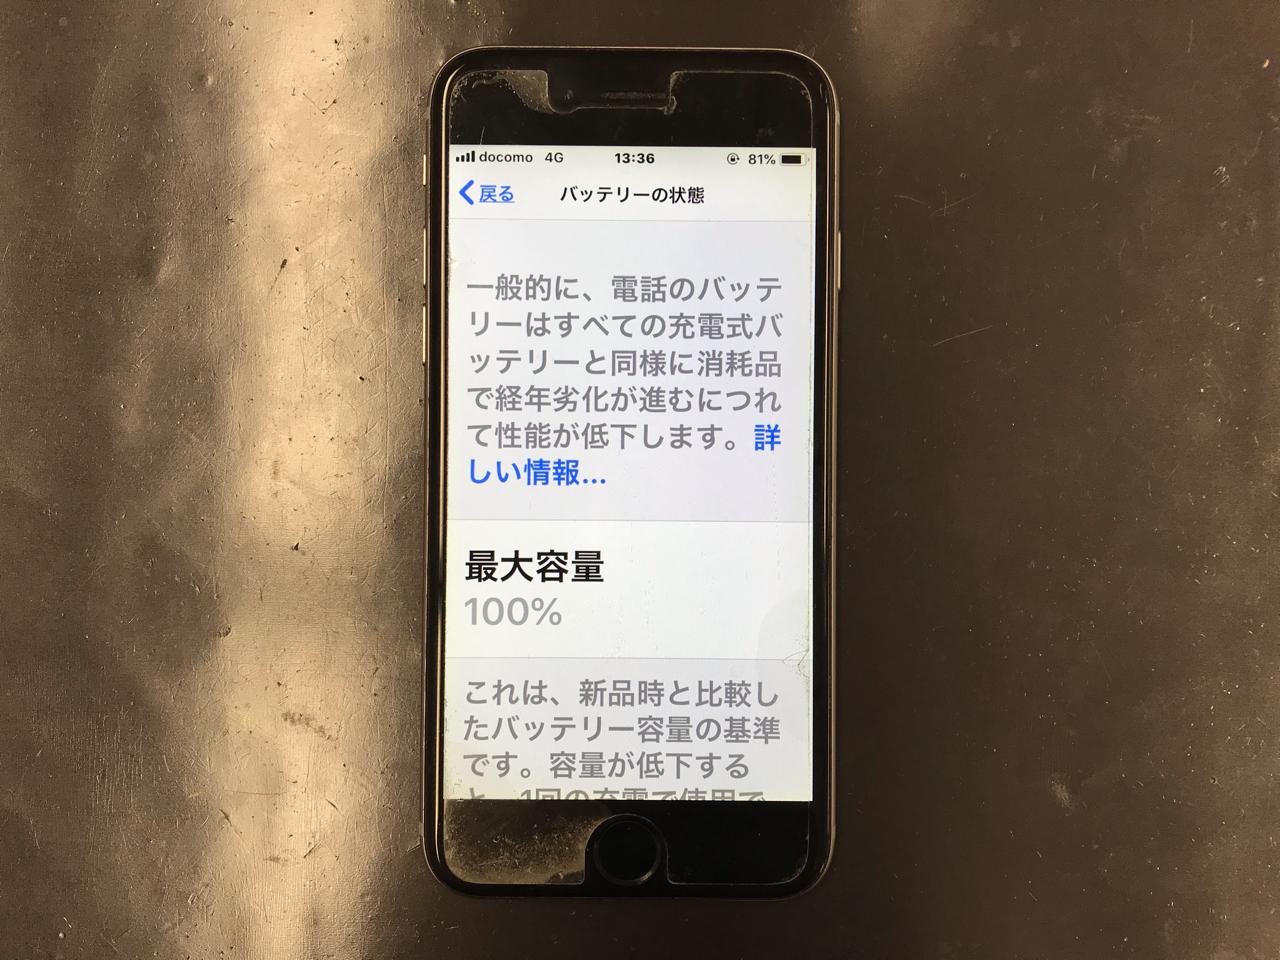 70b3c0f5-5e6e-4166-85f3-deb51068ae9d_1543381625_-1852697184 バッテリーが酷く劣化したiPhone6のバッテリー交換をしました!